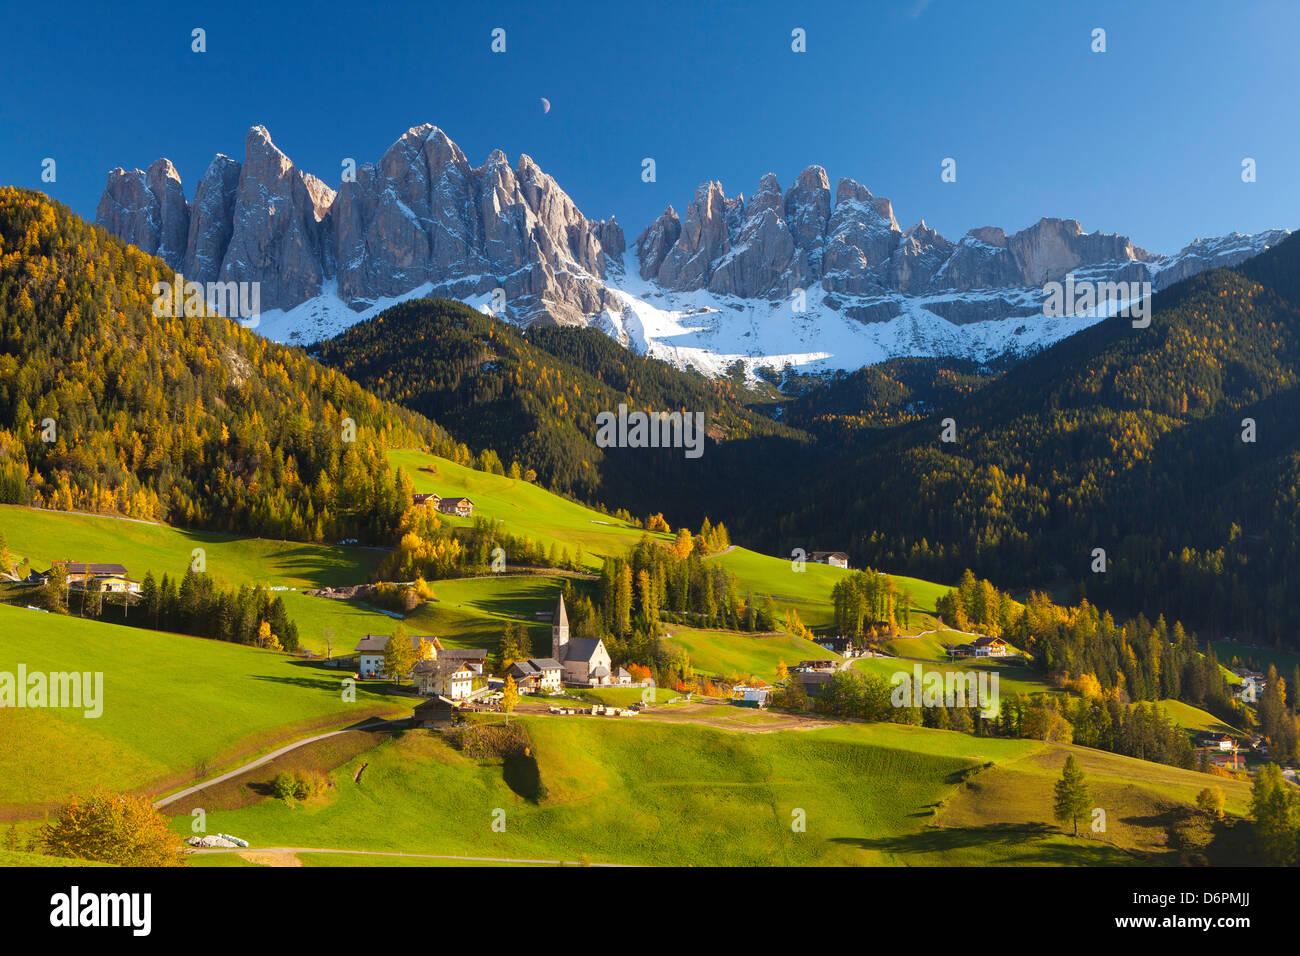 St. Magdalena, Val di Funes, Trentino-Alto Adige, Dolomiten, Südtirol, Italien, Europa Stockbild